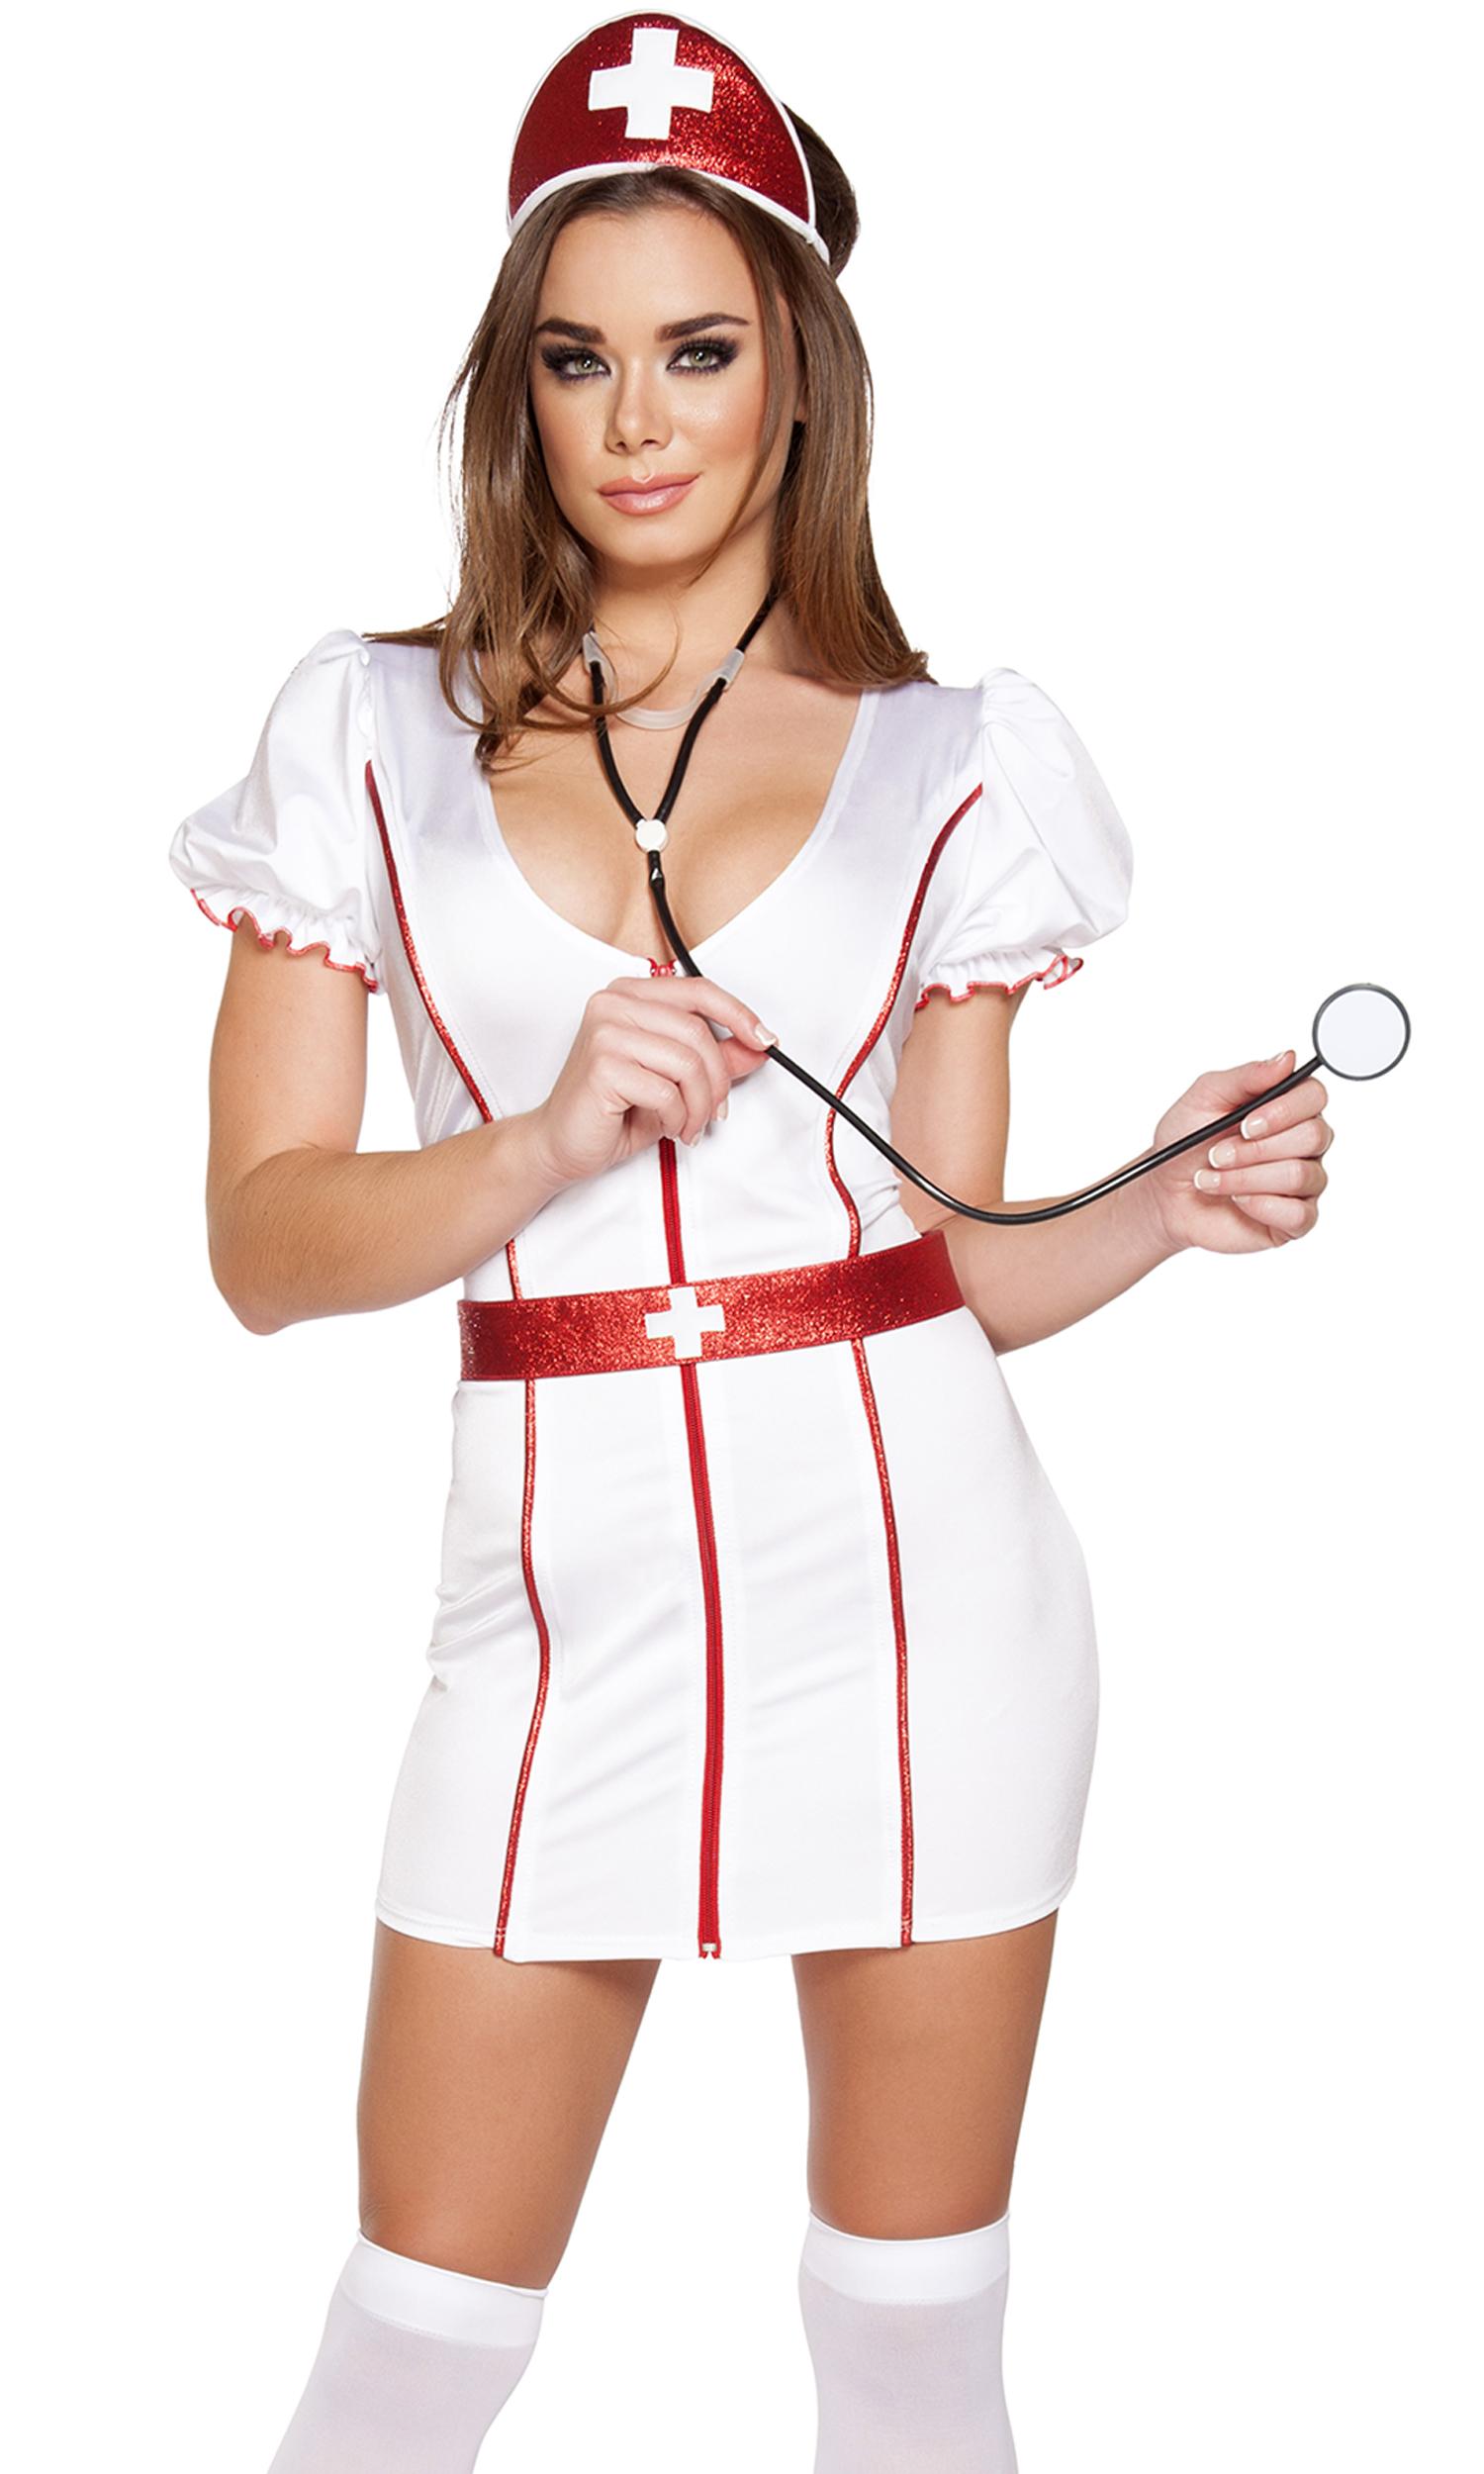 chick-hot-girl-nurses